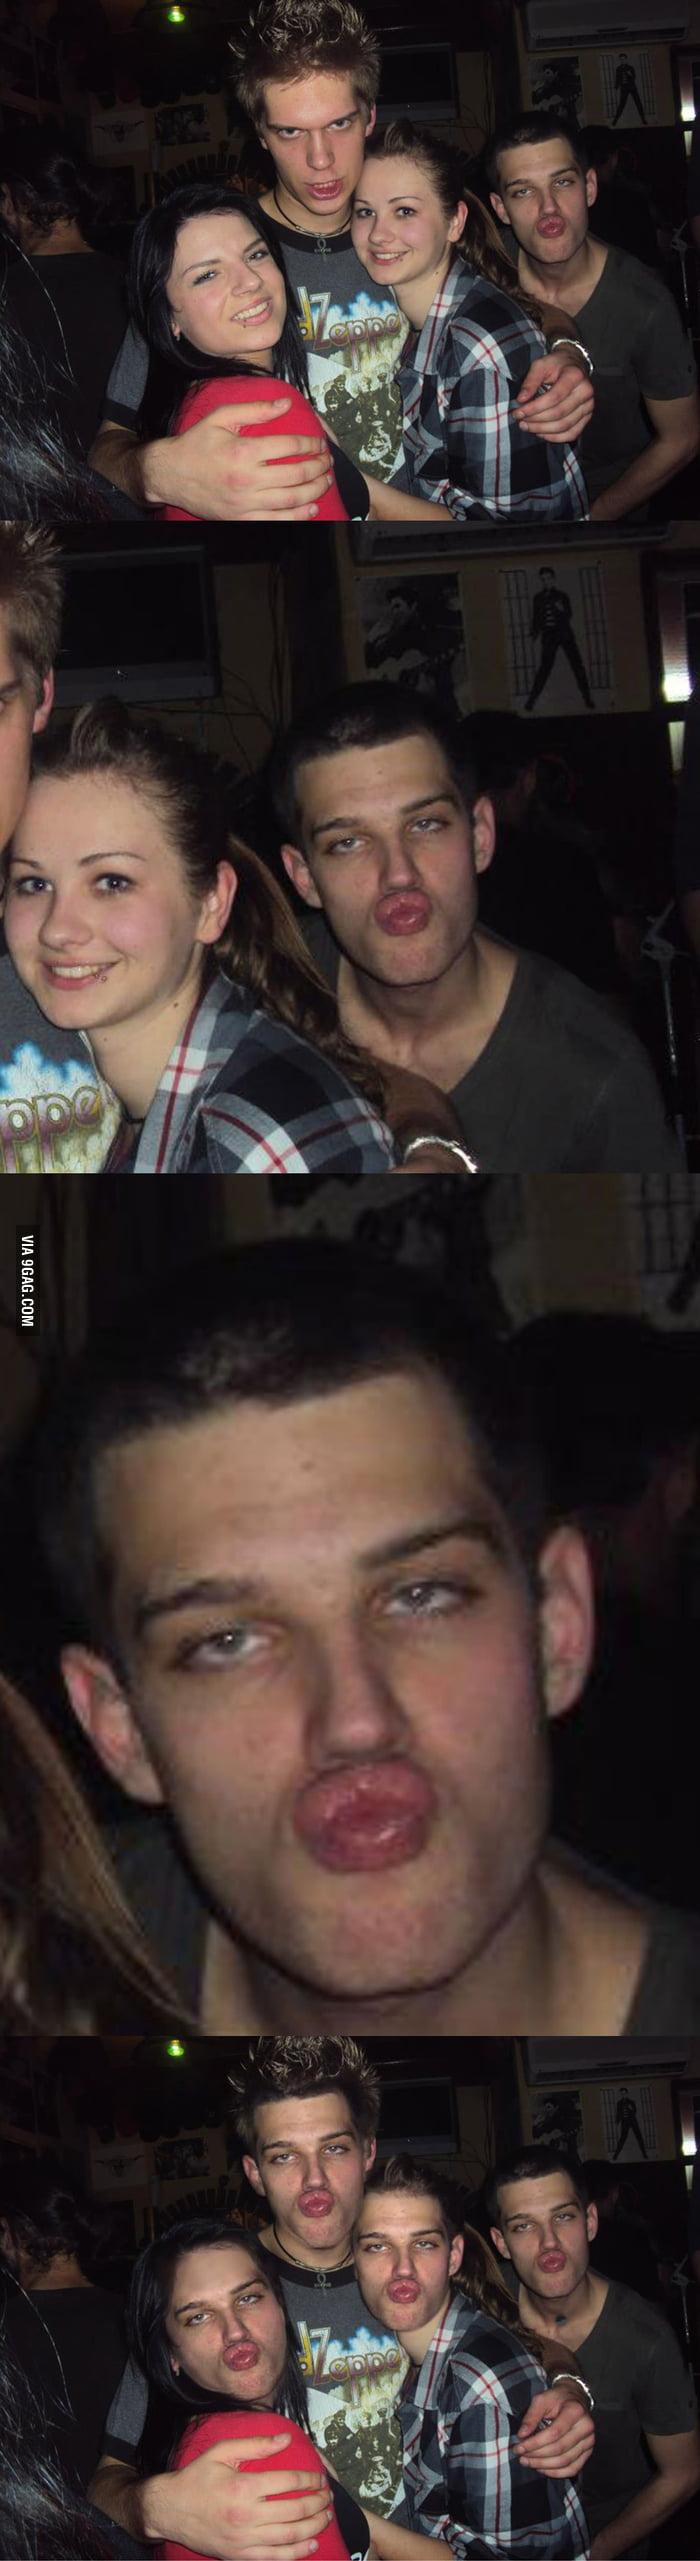 Face swap lvl: drunk photobombing